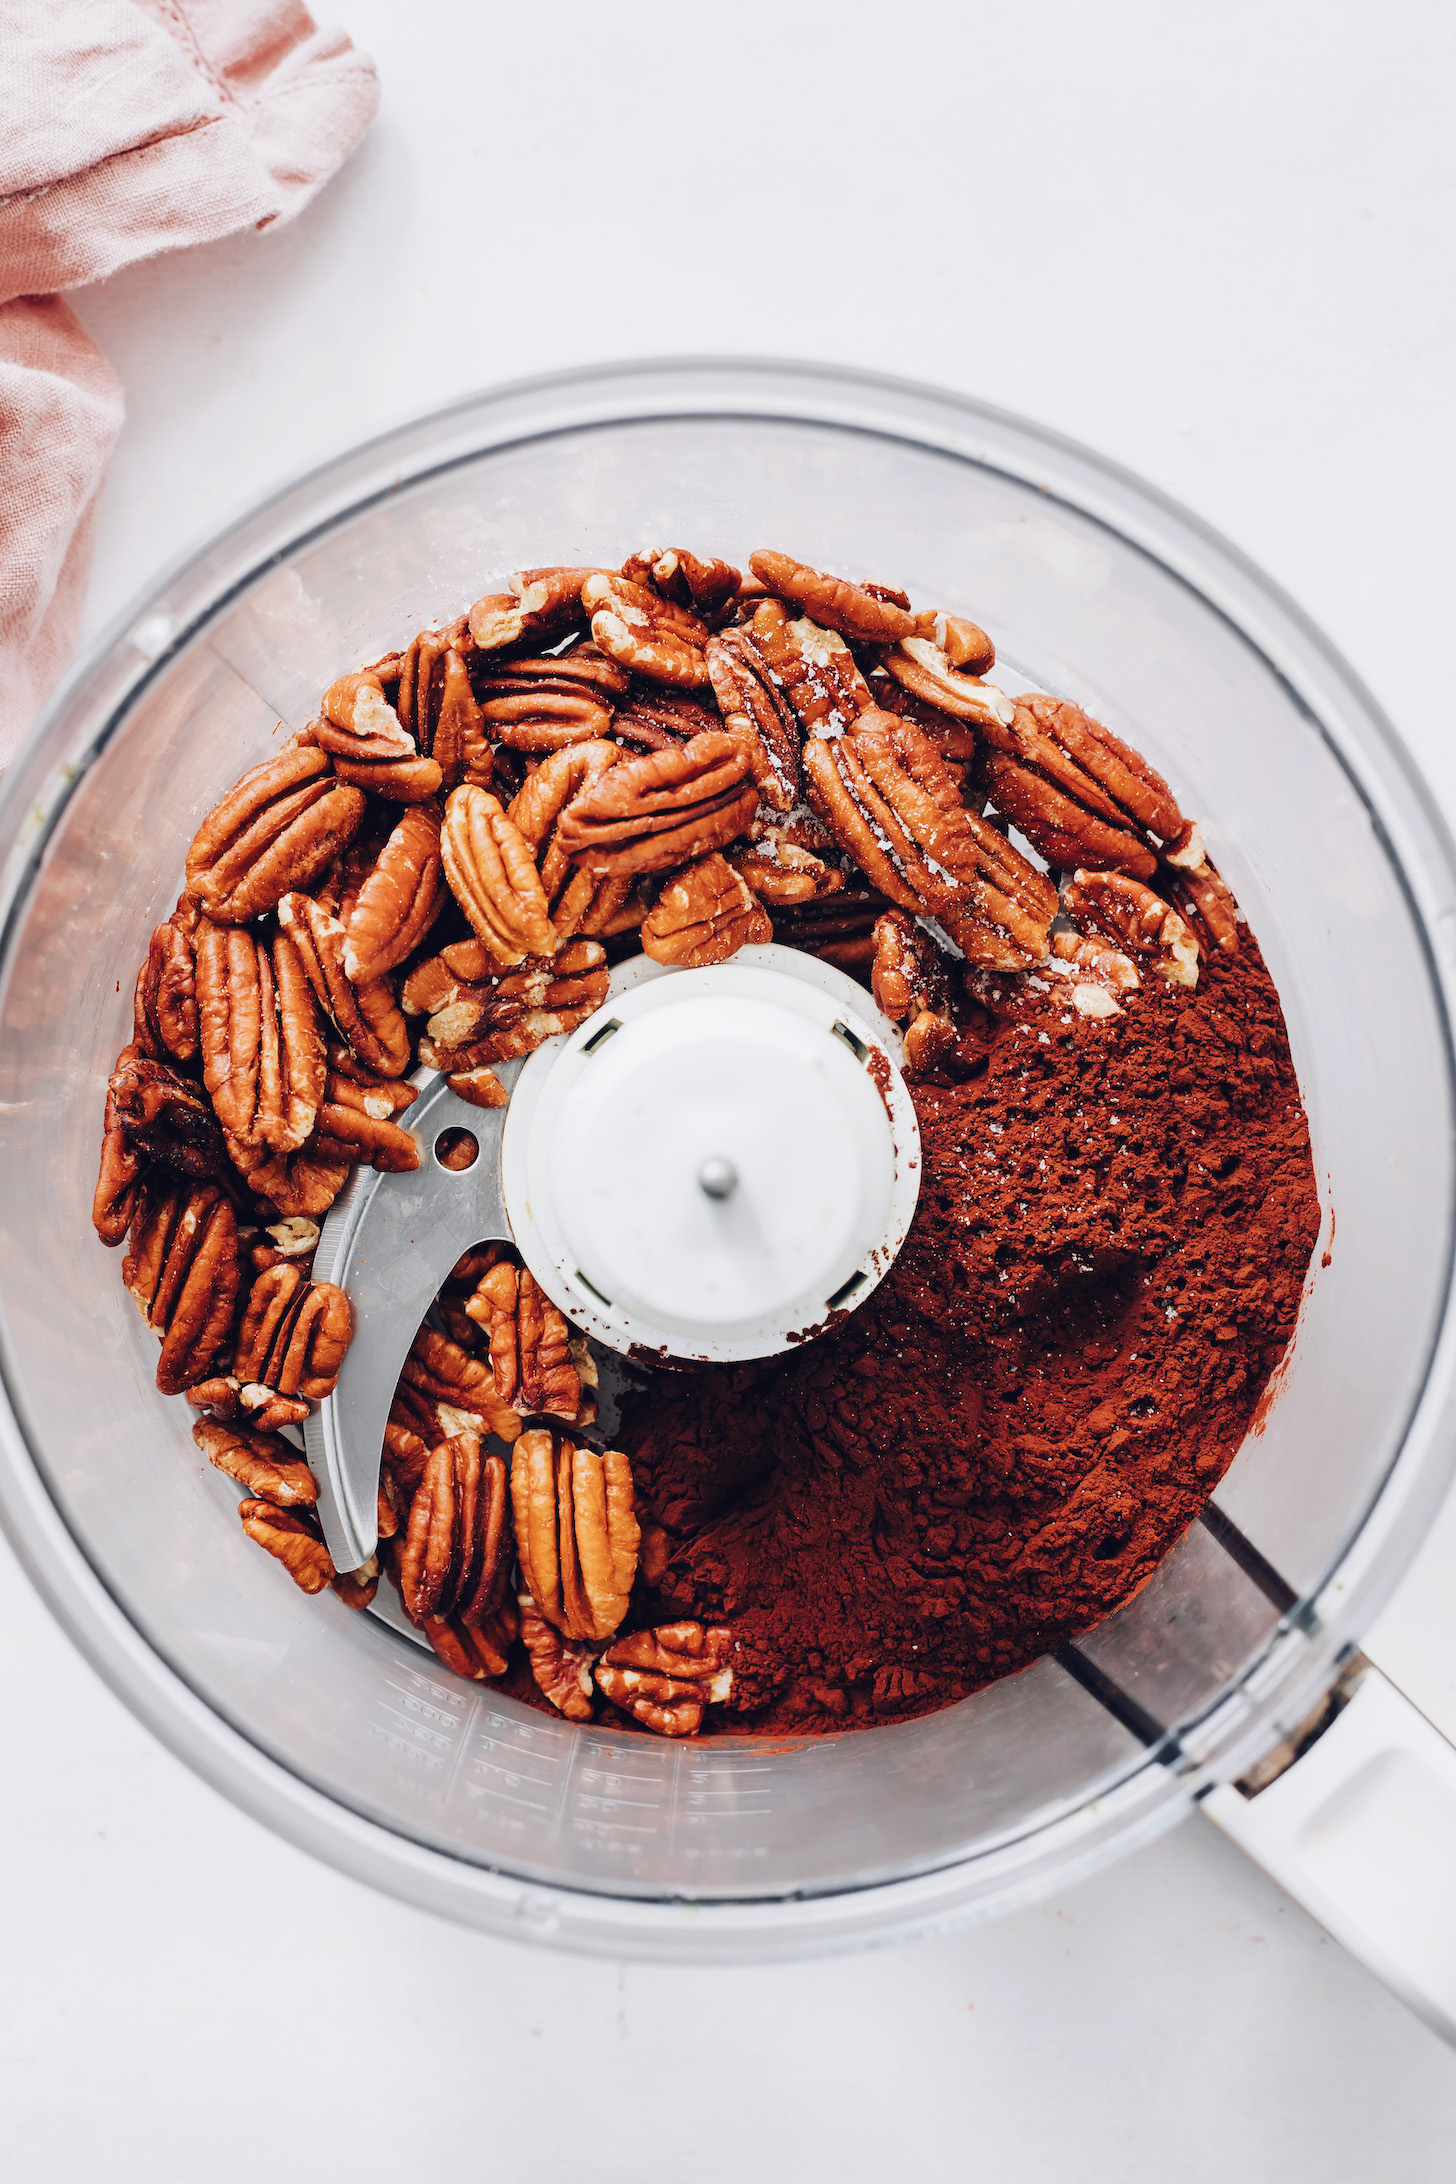 Pecans, salt, and cocoa powder in a food processor